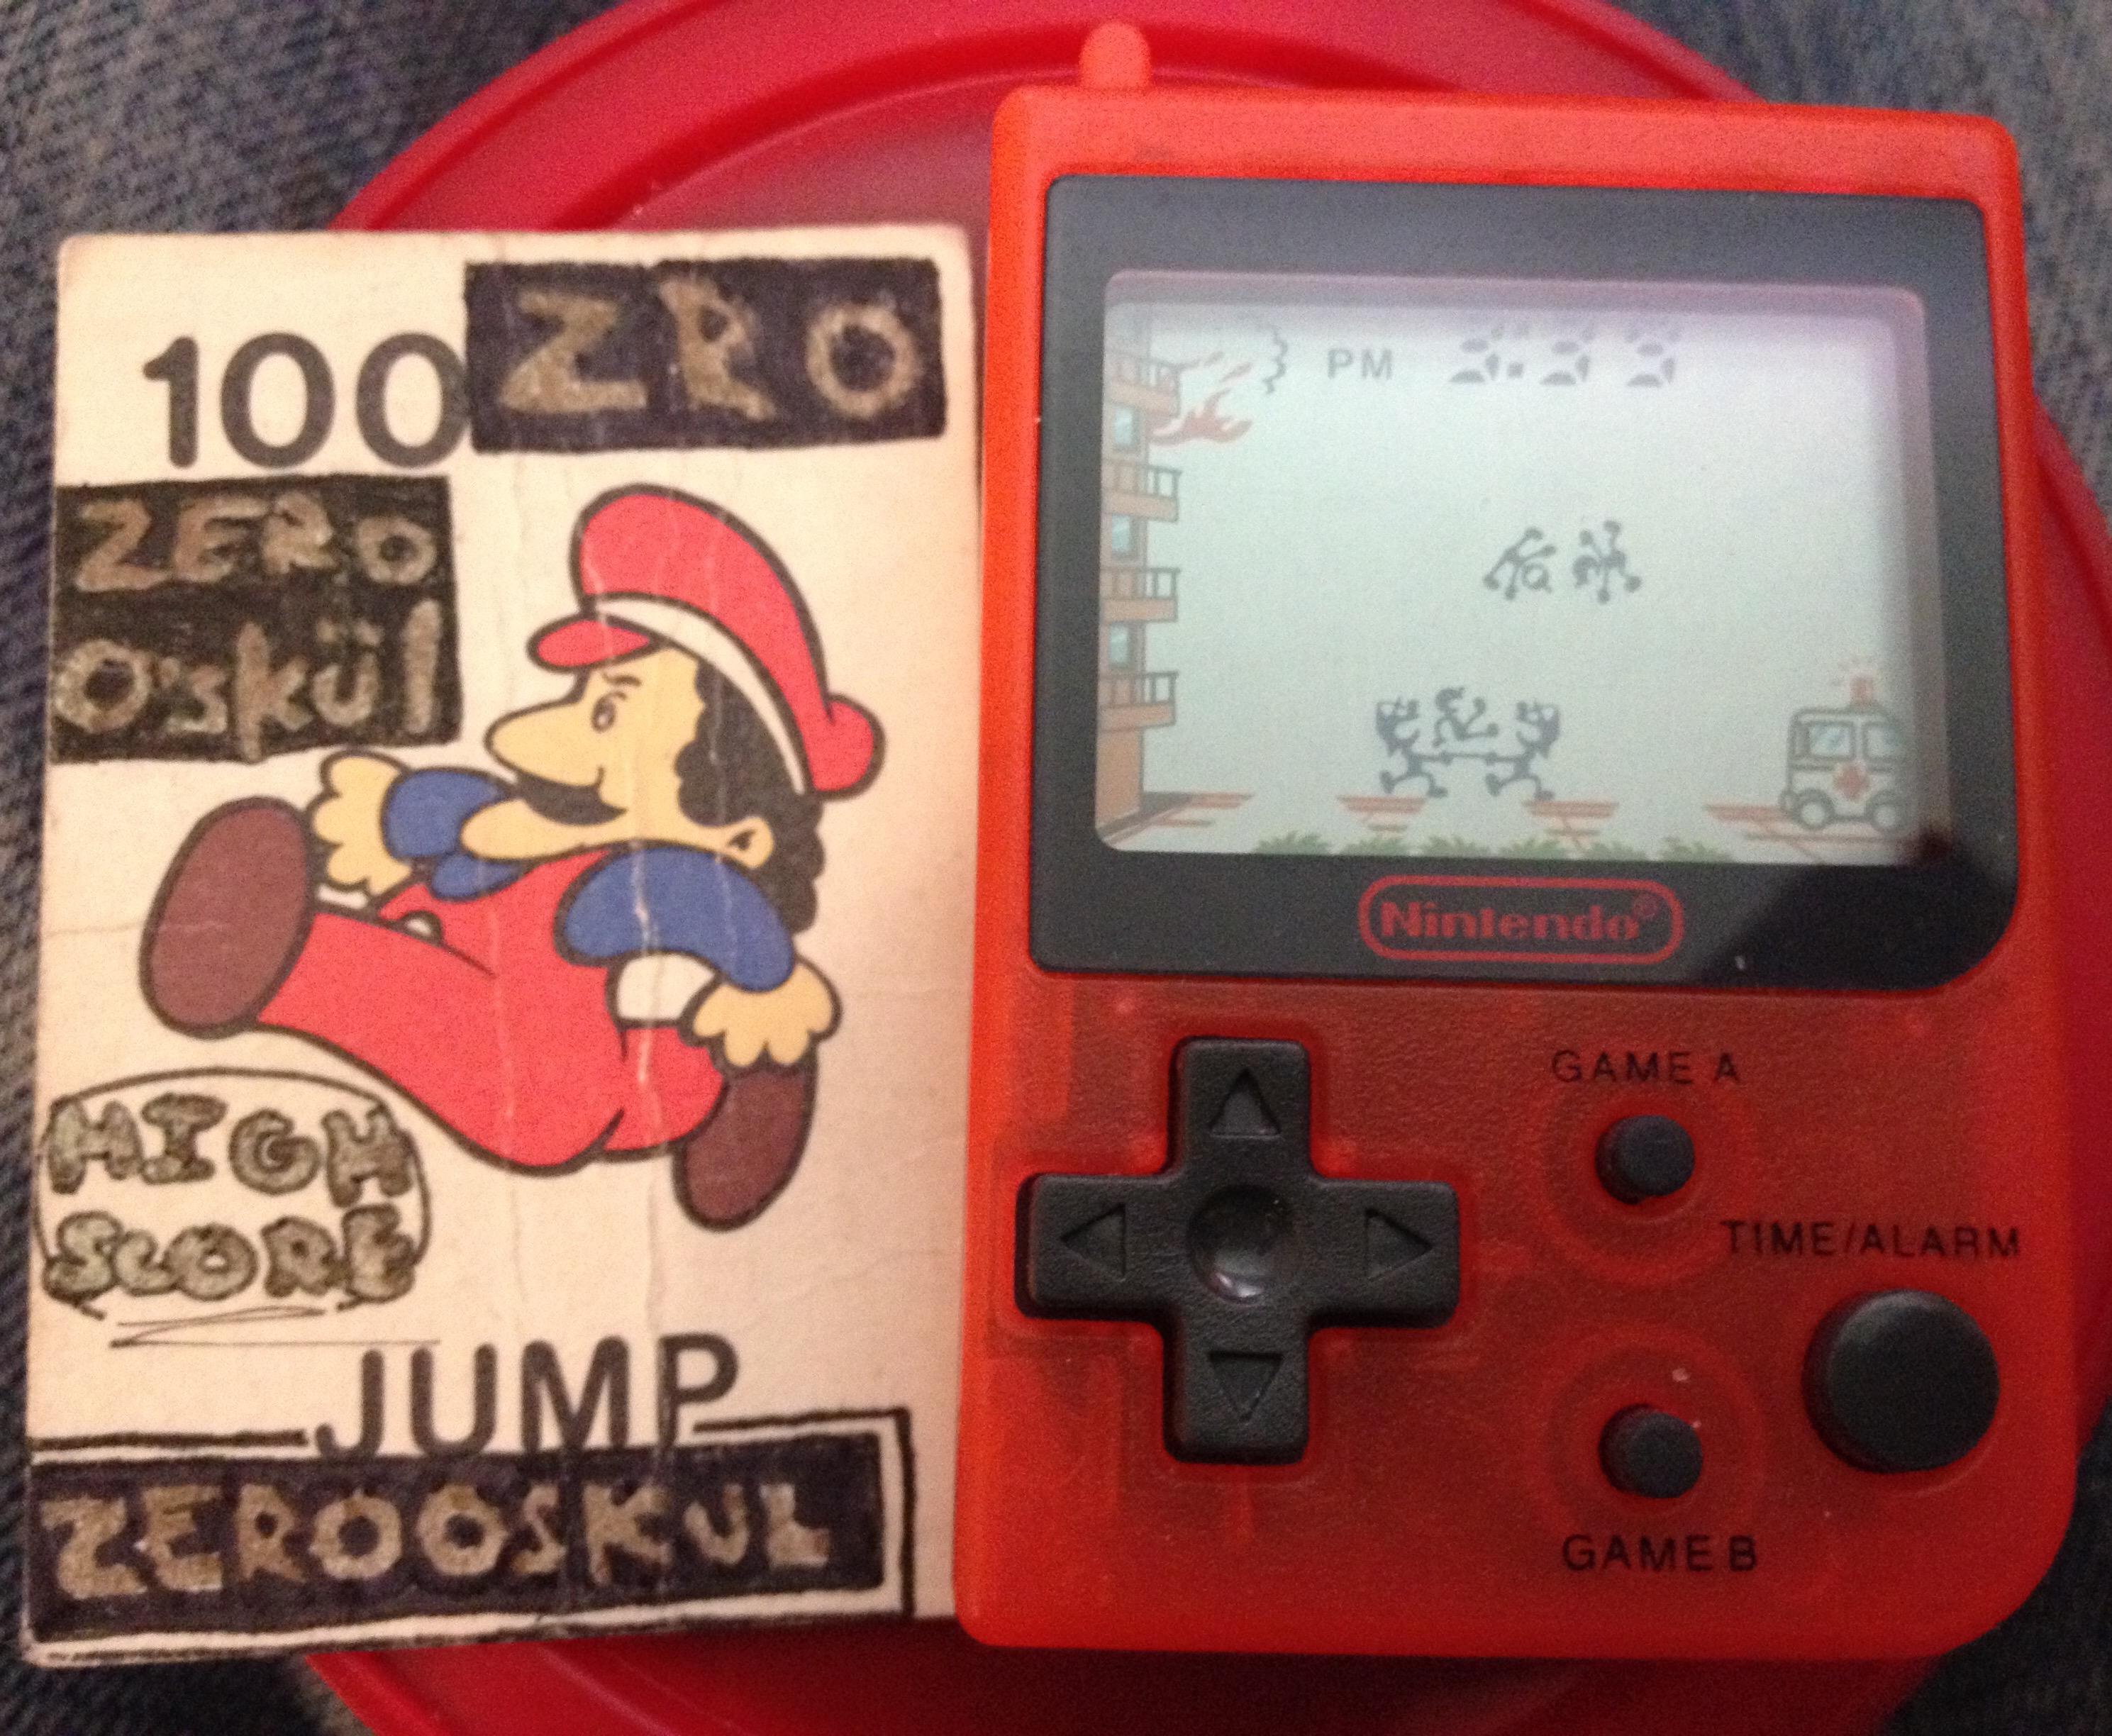 Nintendo Mini Classics: Fire [Game A] 898 points